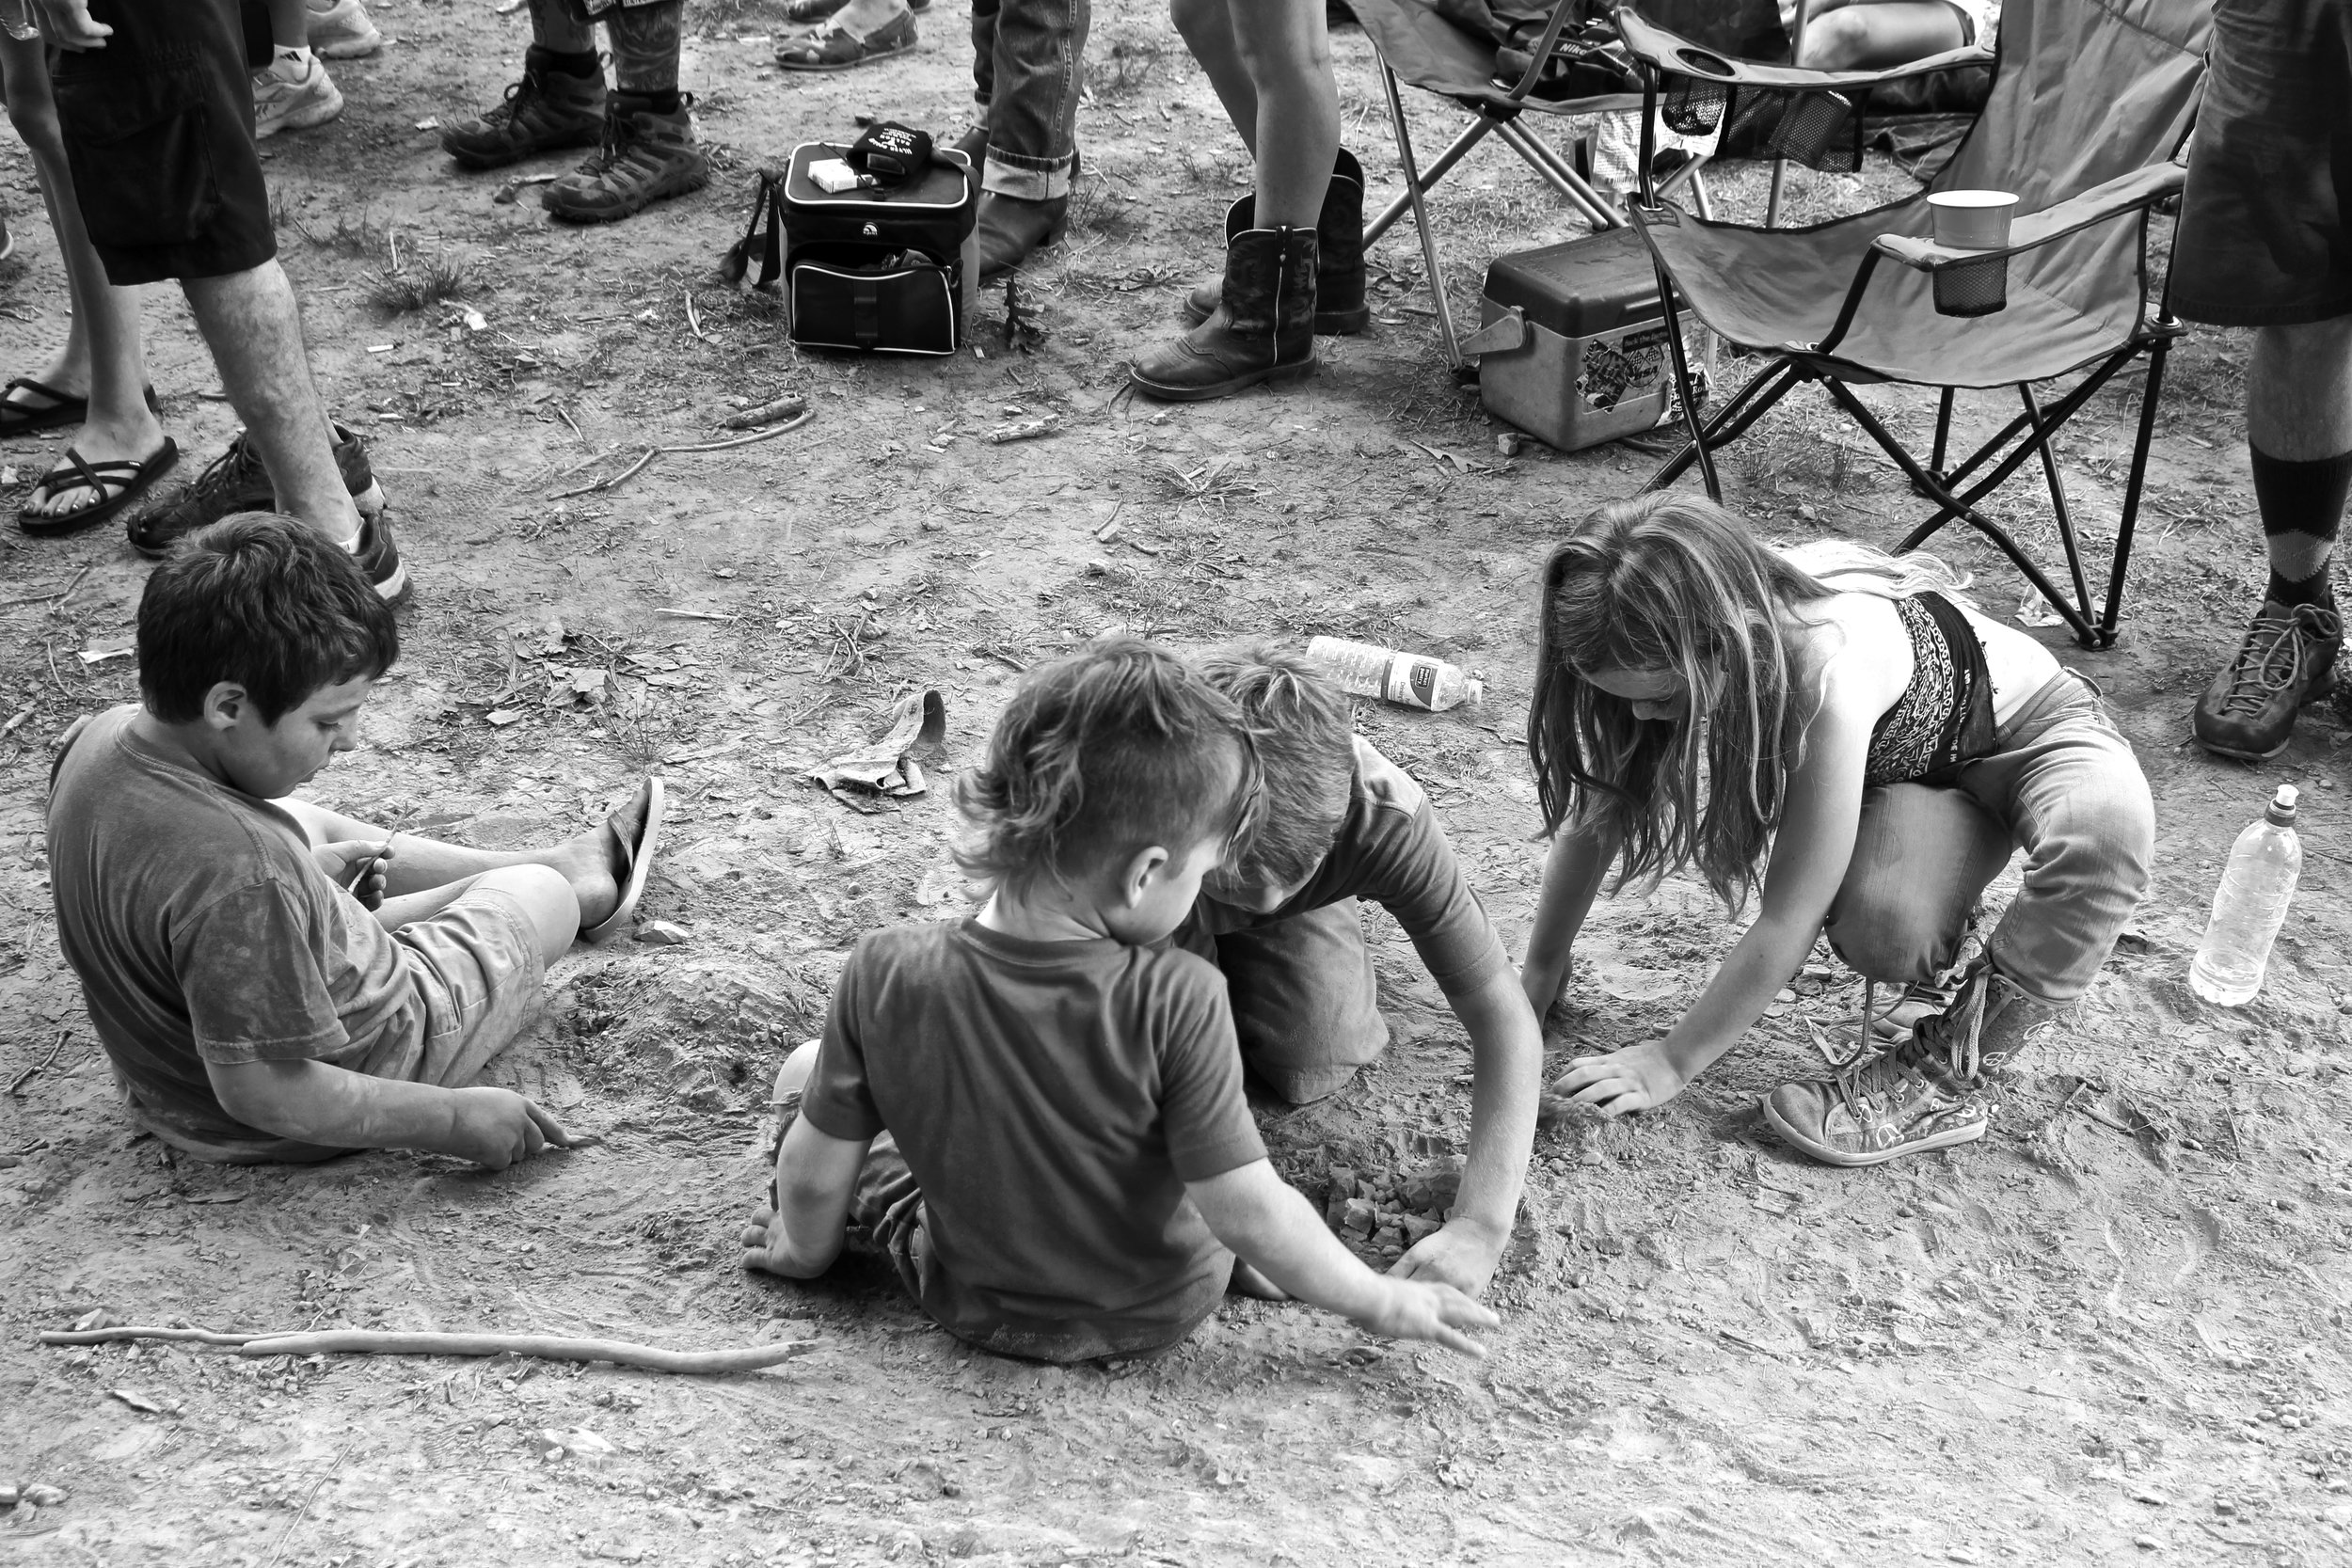 Children of Muddy Roots